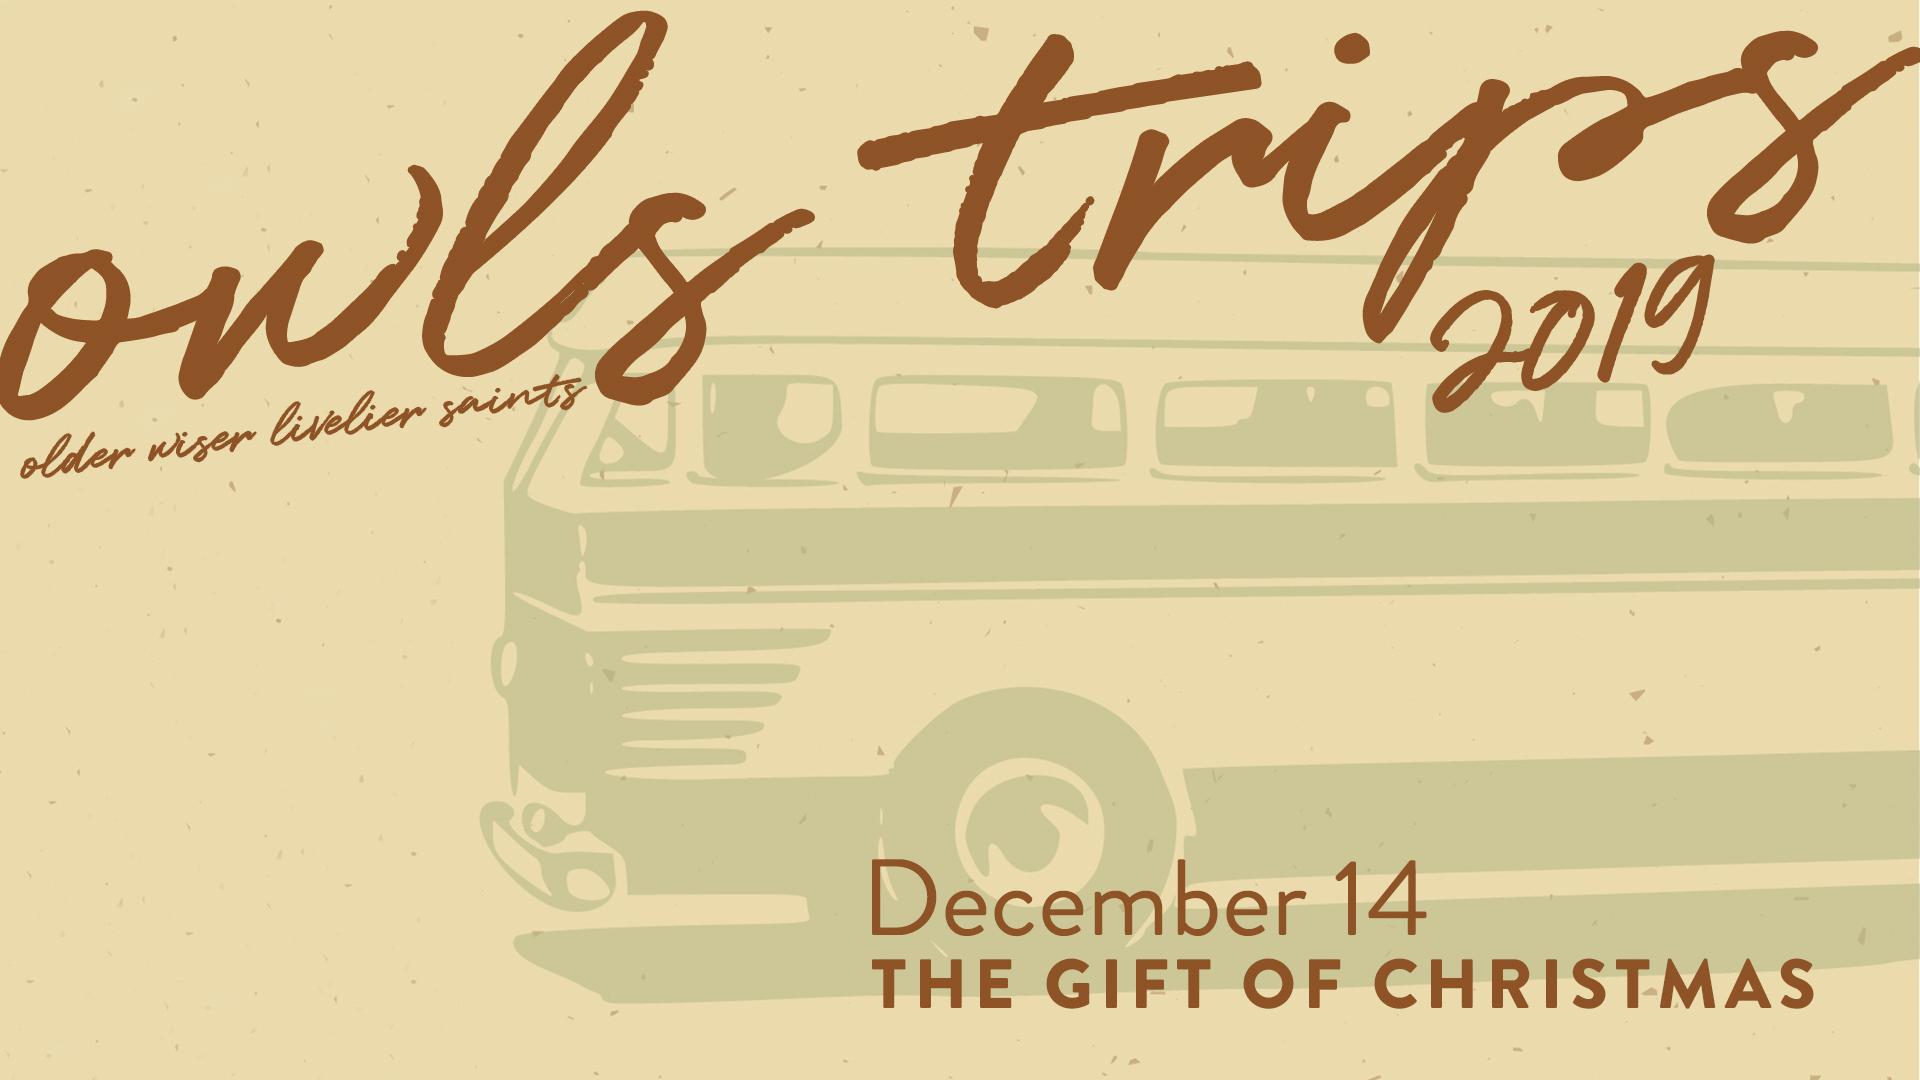 The-Gift-of-Christmas.jpg